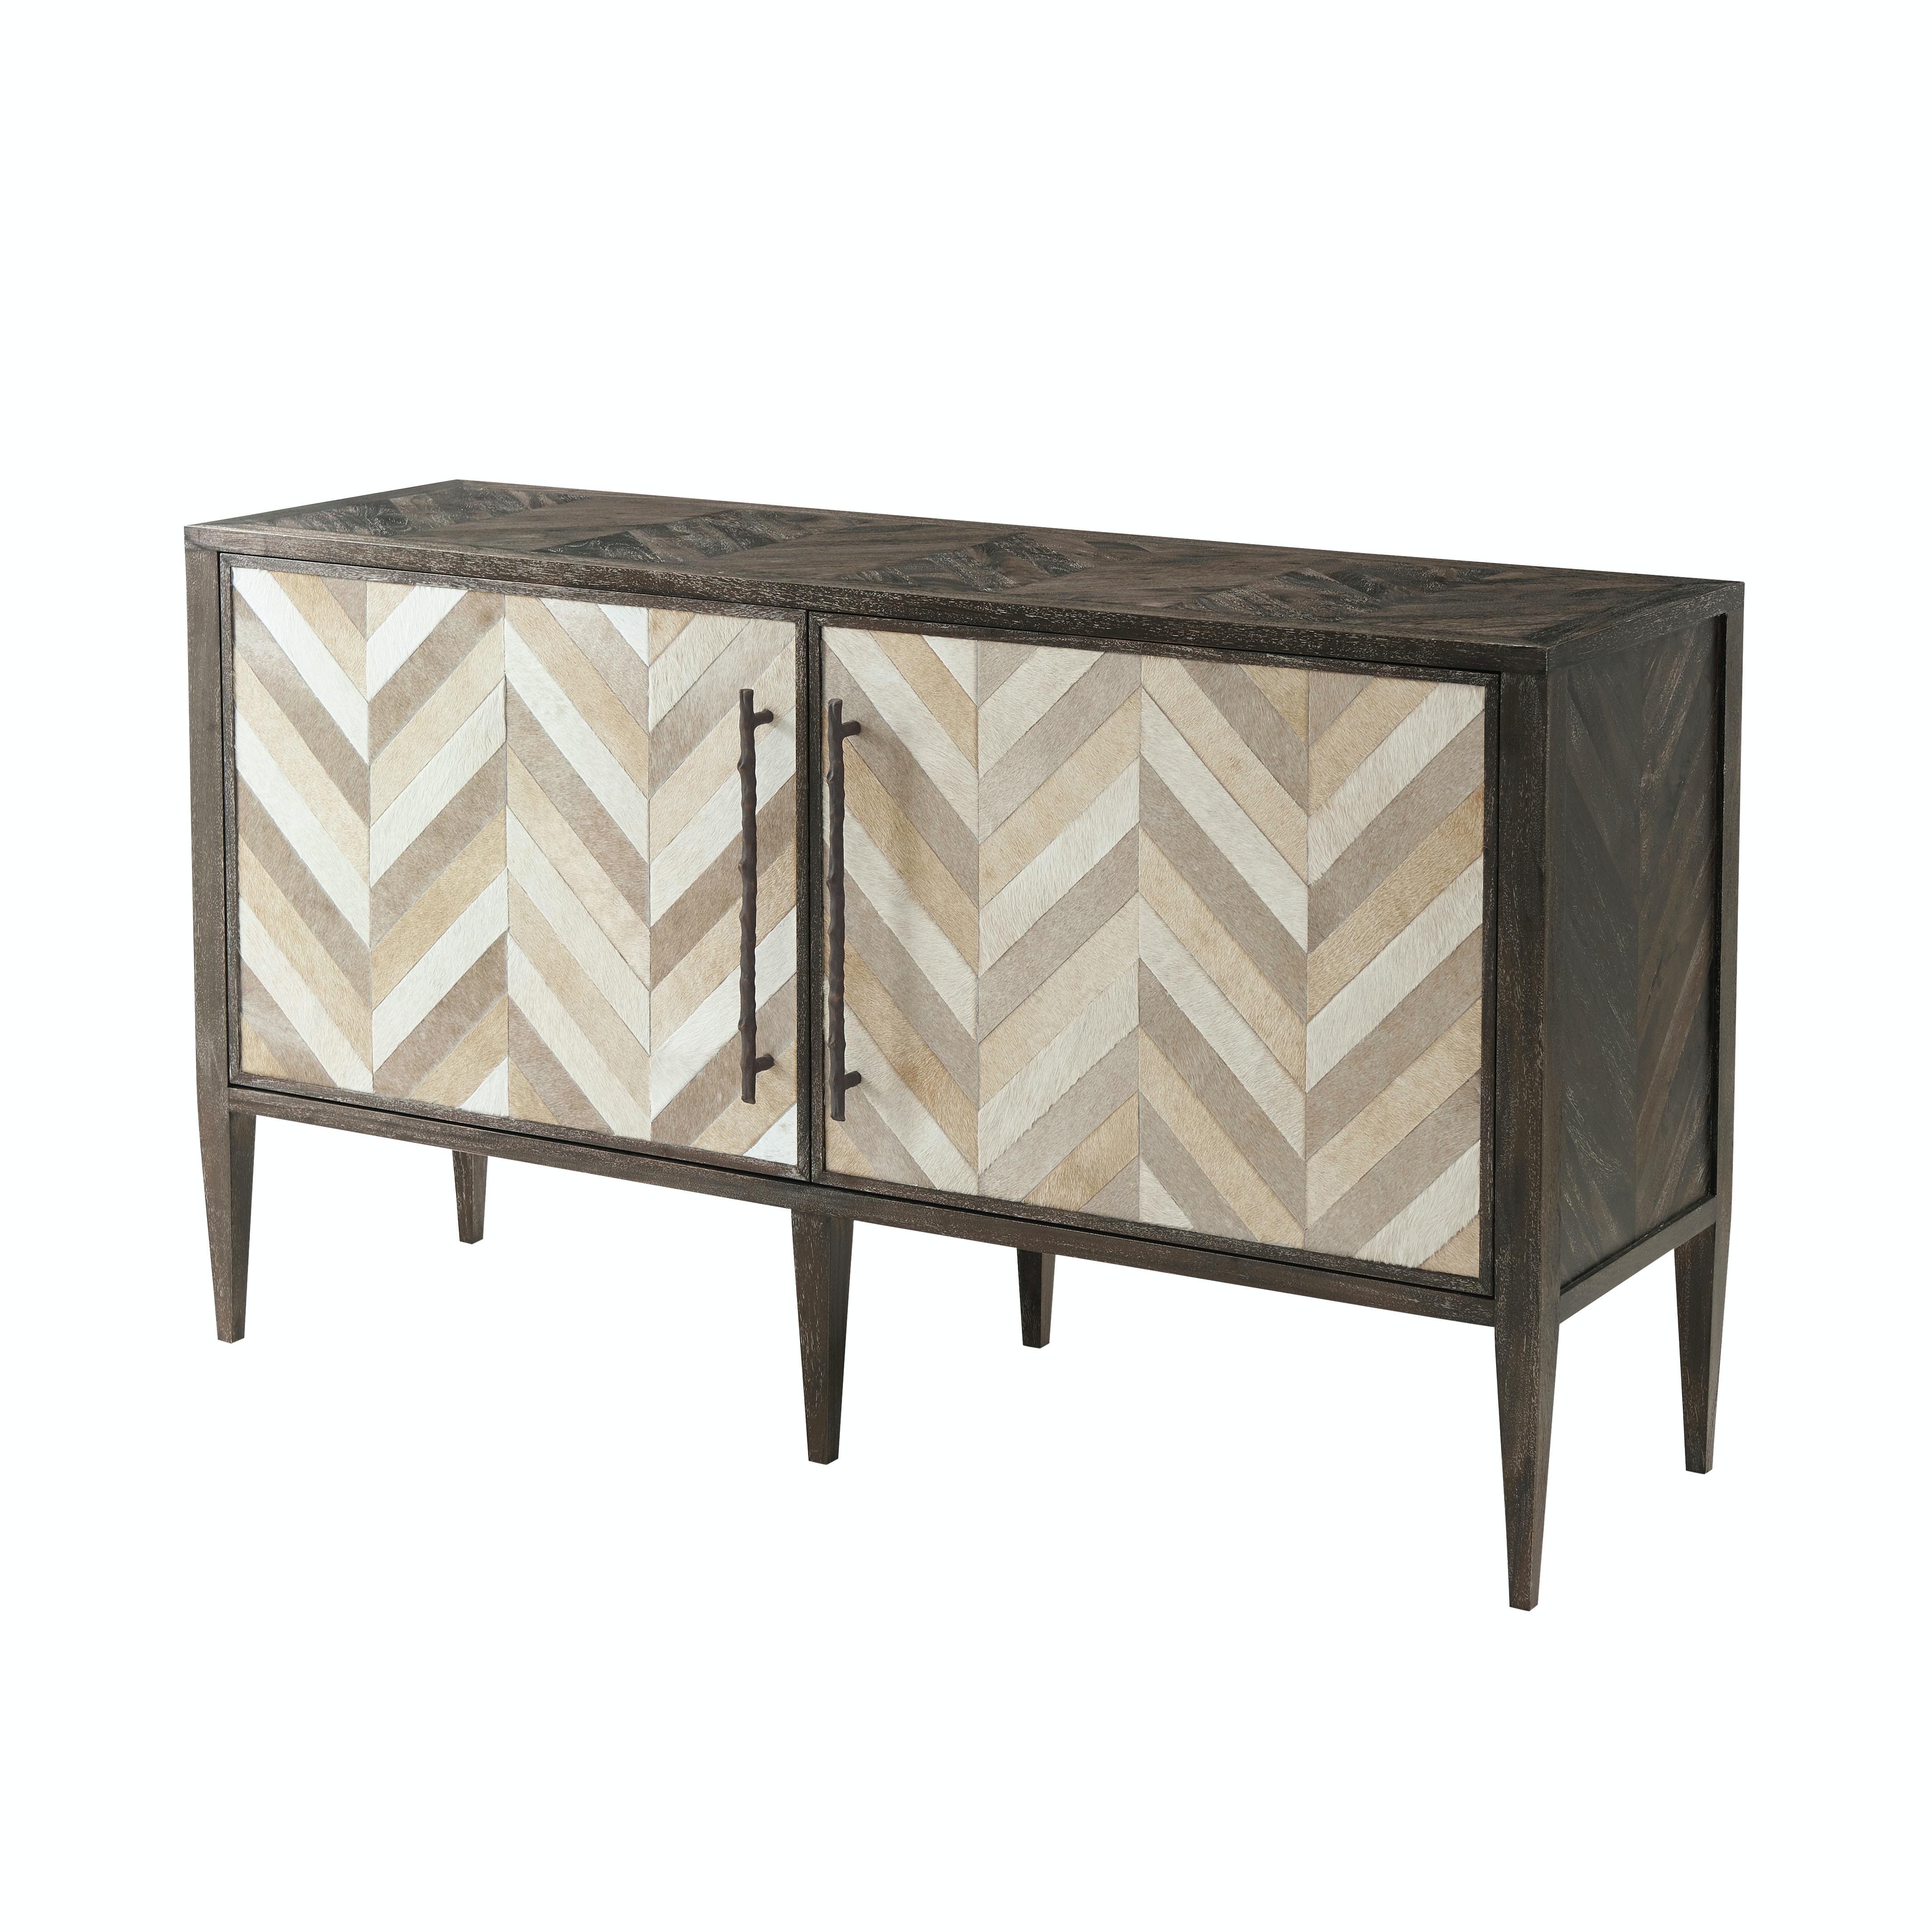 Theodore Alexander Burnet TH6100226 From Walter E. Smithe Furniture + Design